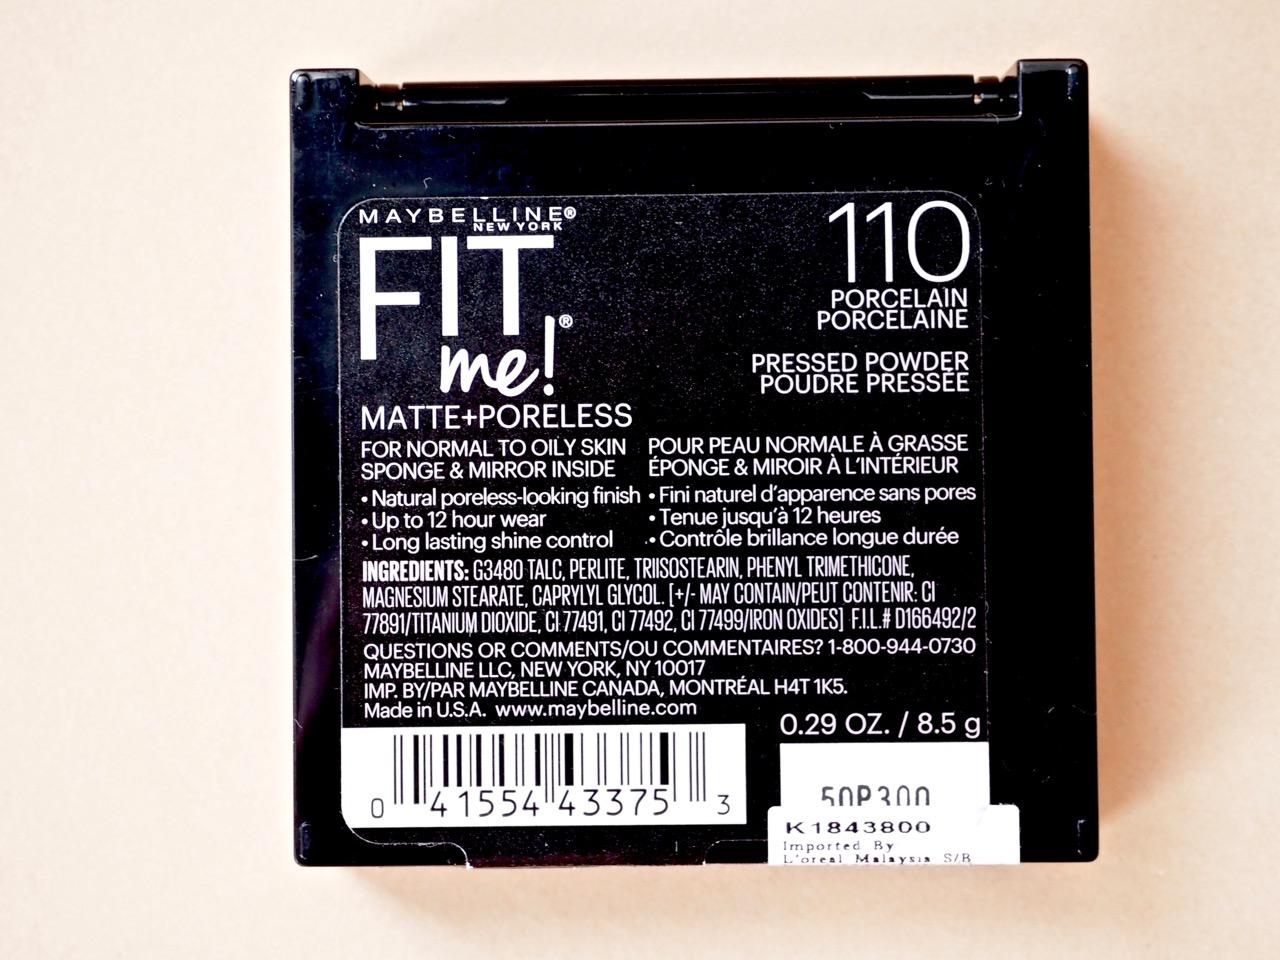 Maybellinen Fit Me Matte+Poreless Powder Puuteri Kokemuksia